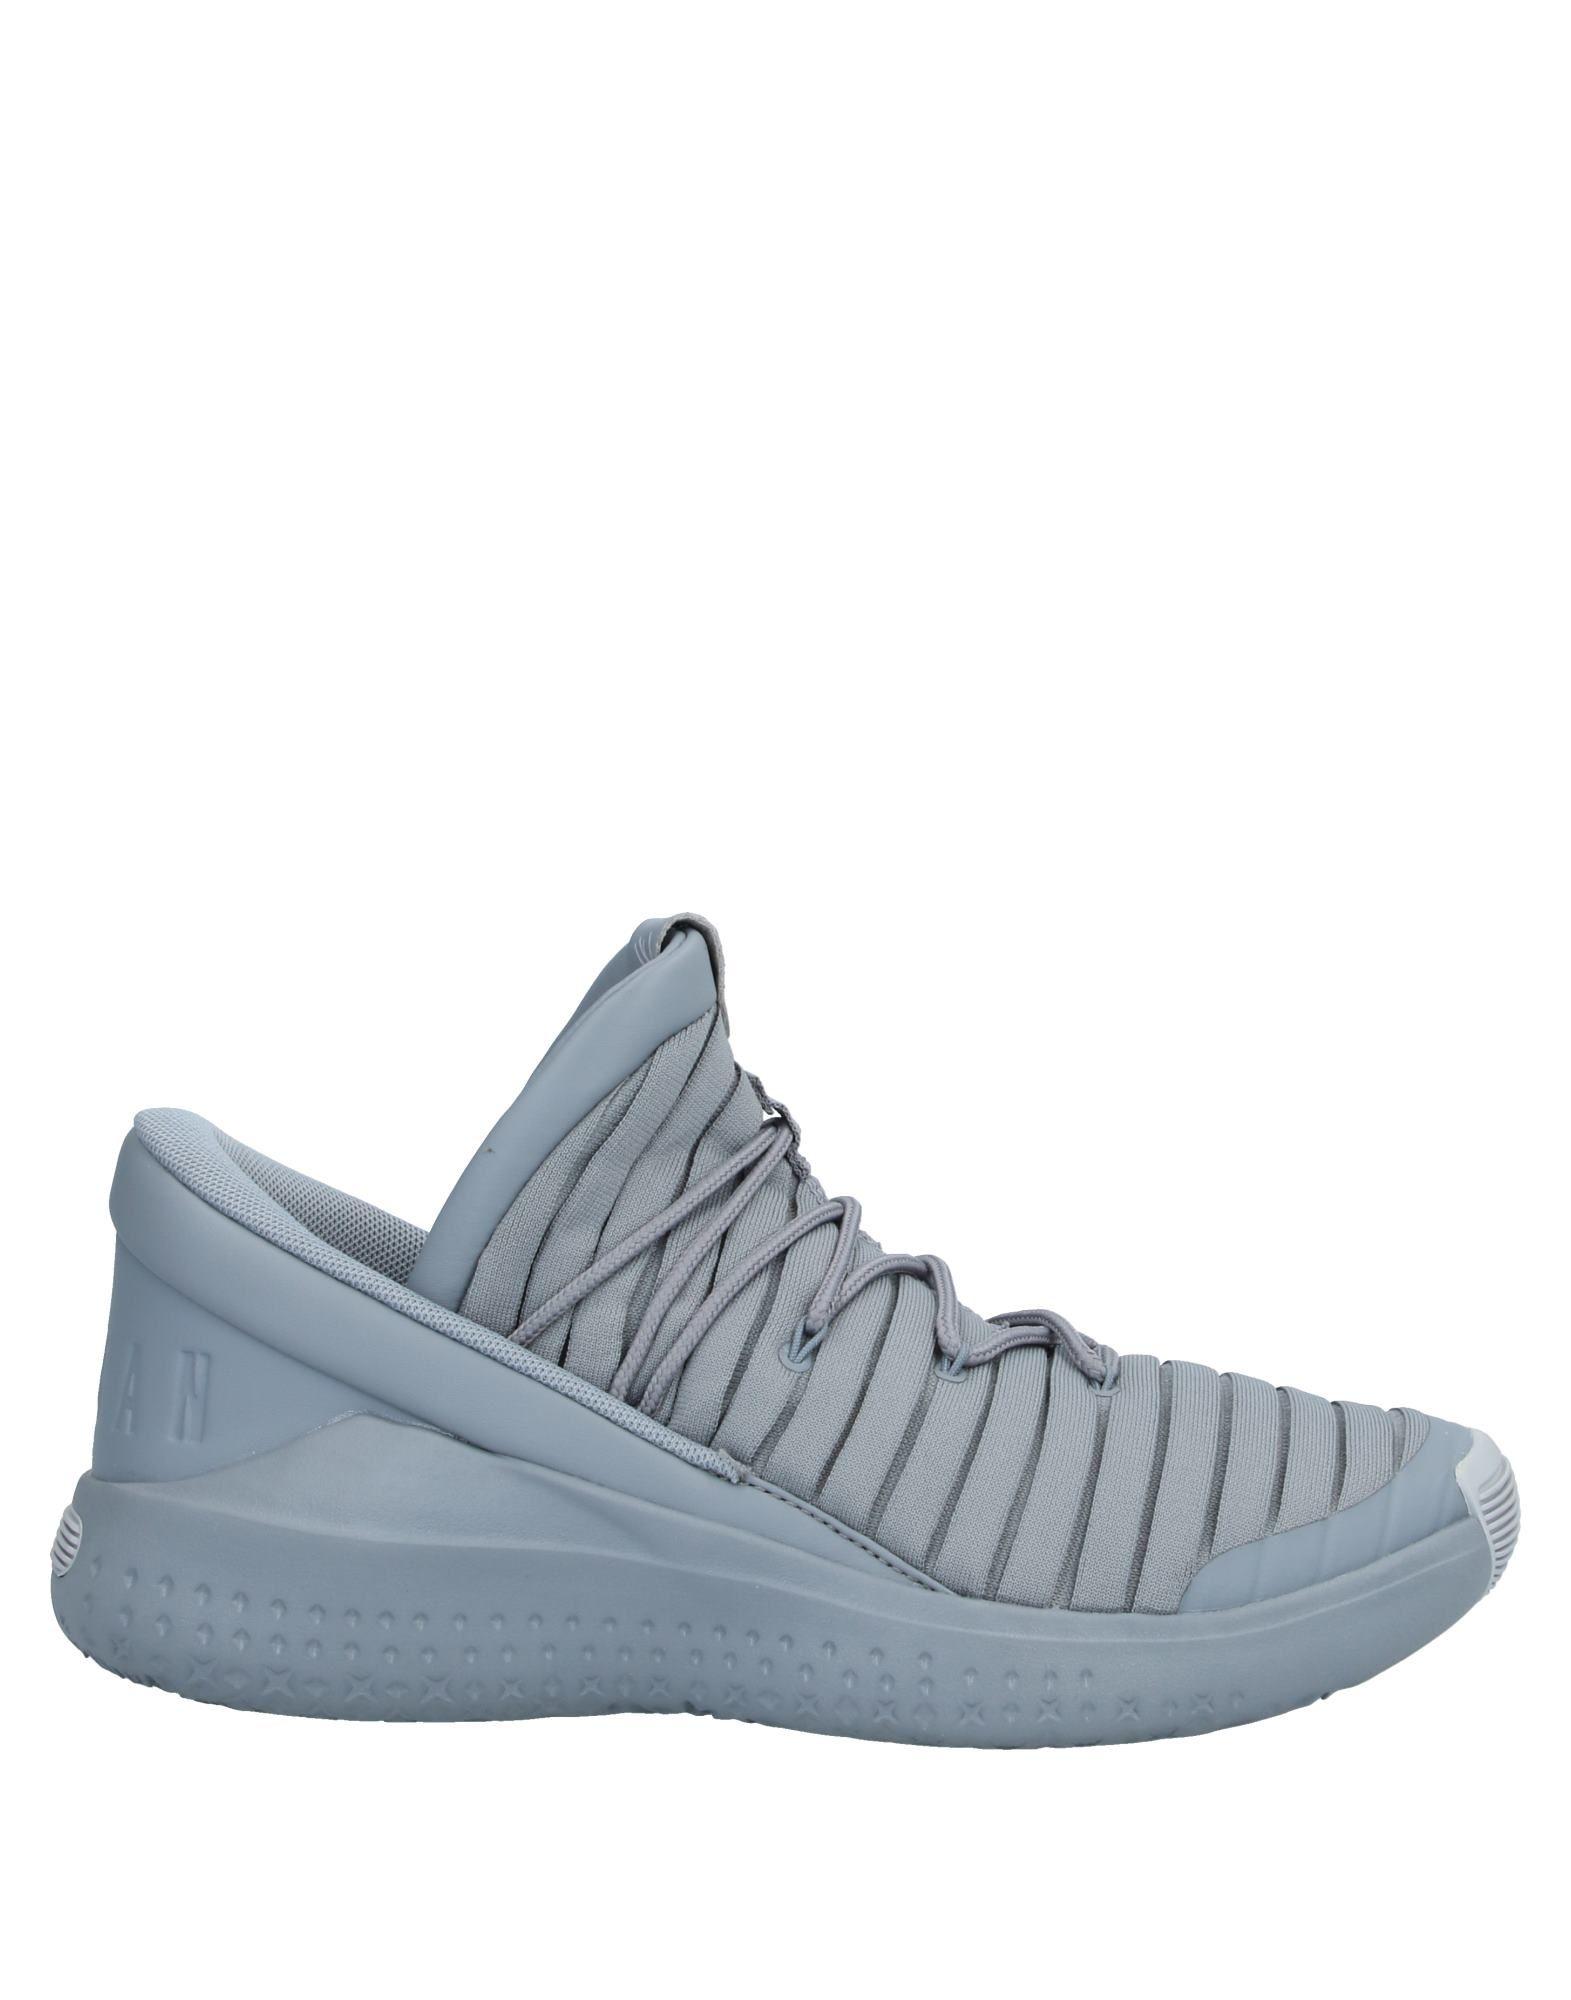 Turnschuhe Nike herren - 11731280WO